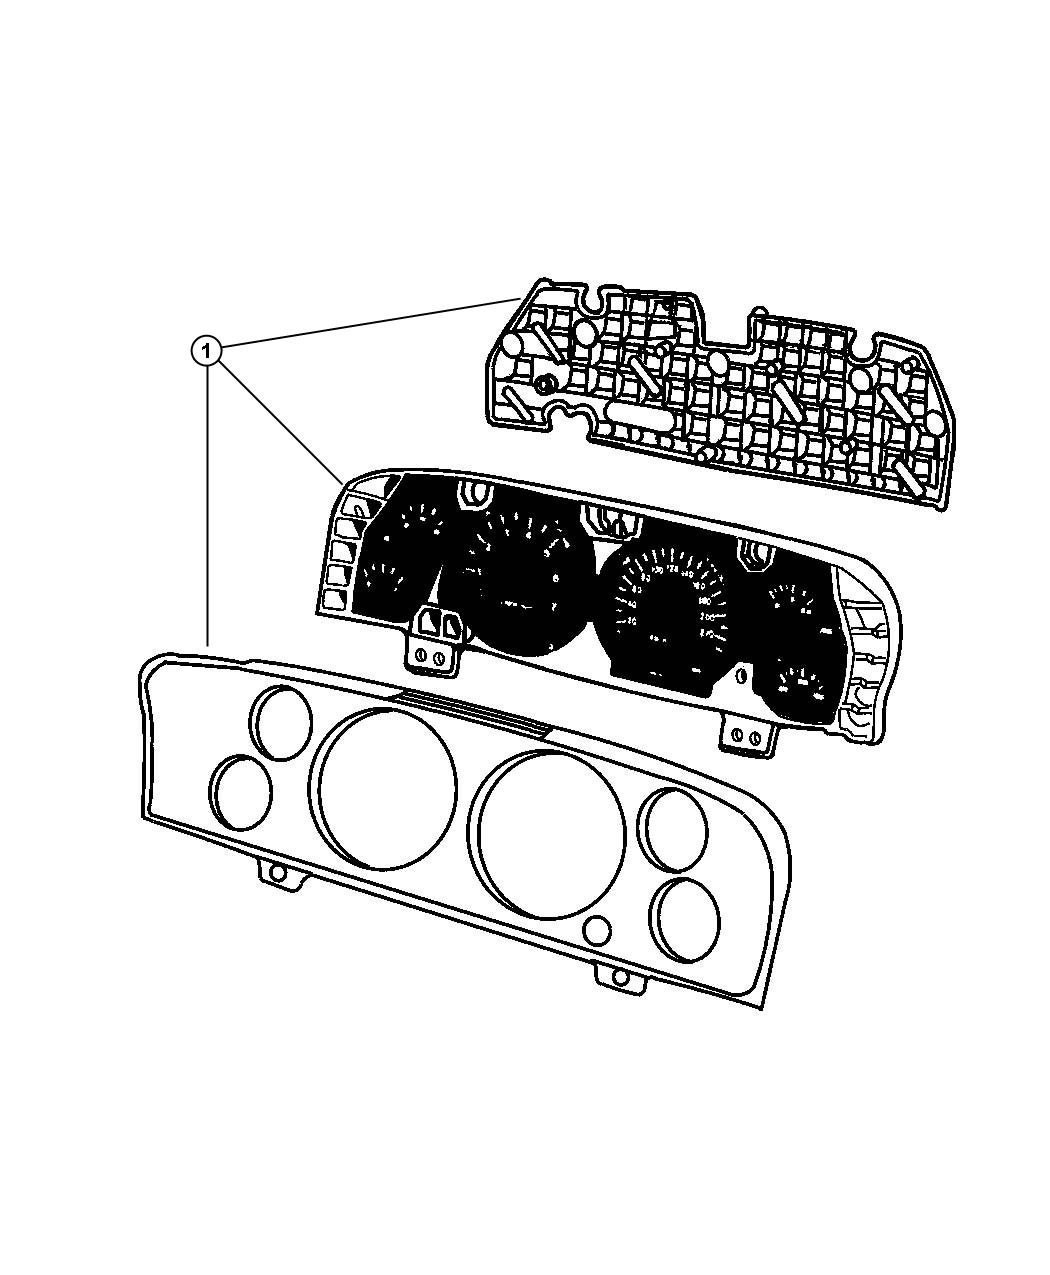 2010 Jeep Commander Cluster. Instrument panel. [middle